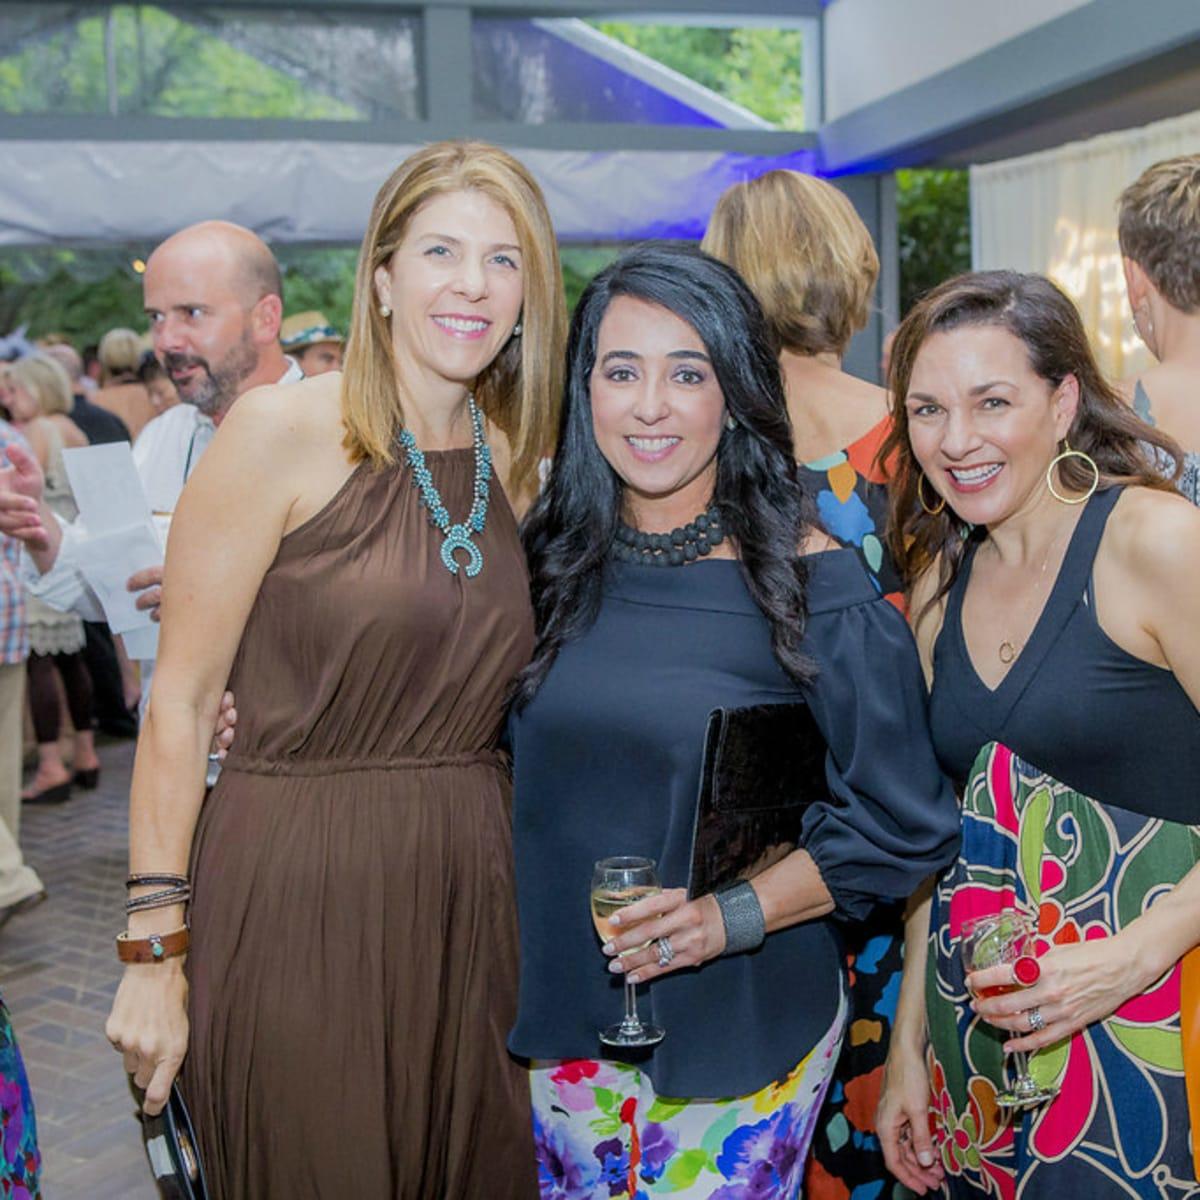 Umlauf Sculpture Garden and Museum Garden Party 2016 Elizabeth Baker Yuniedth Steen Mara Holguin Fouts